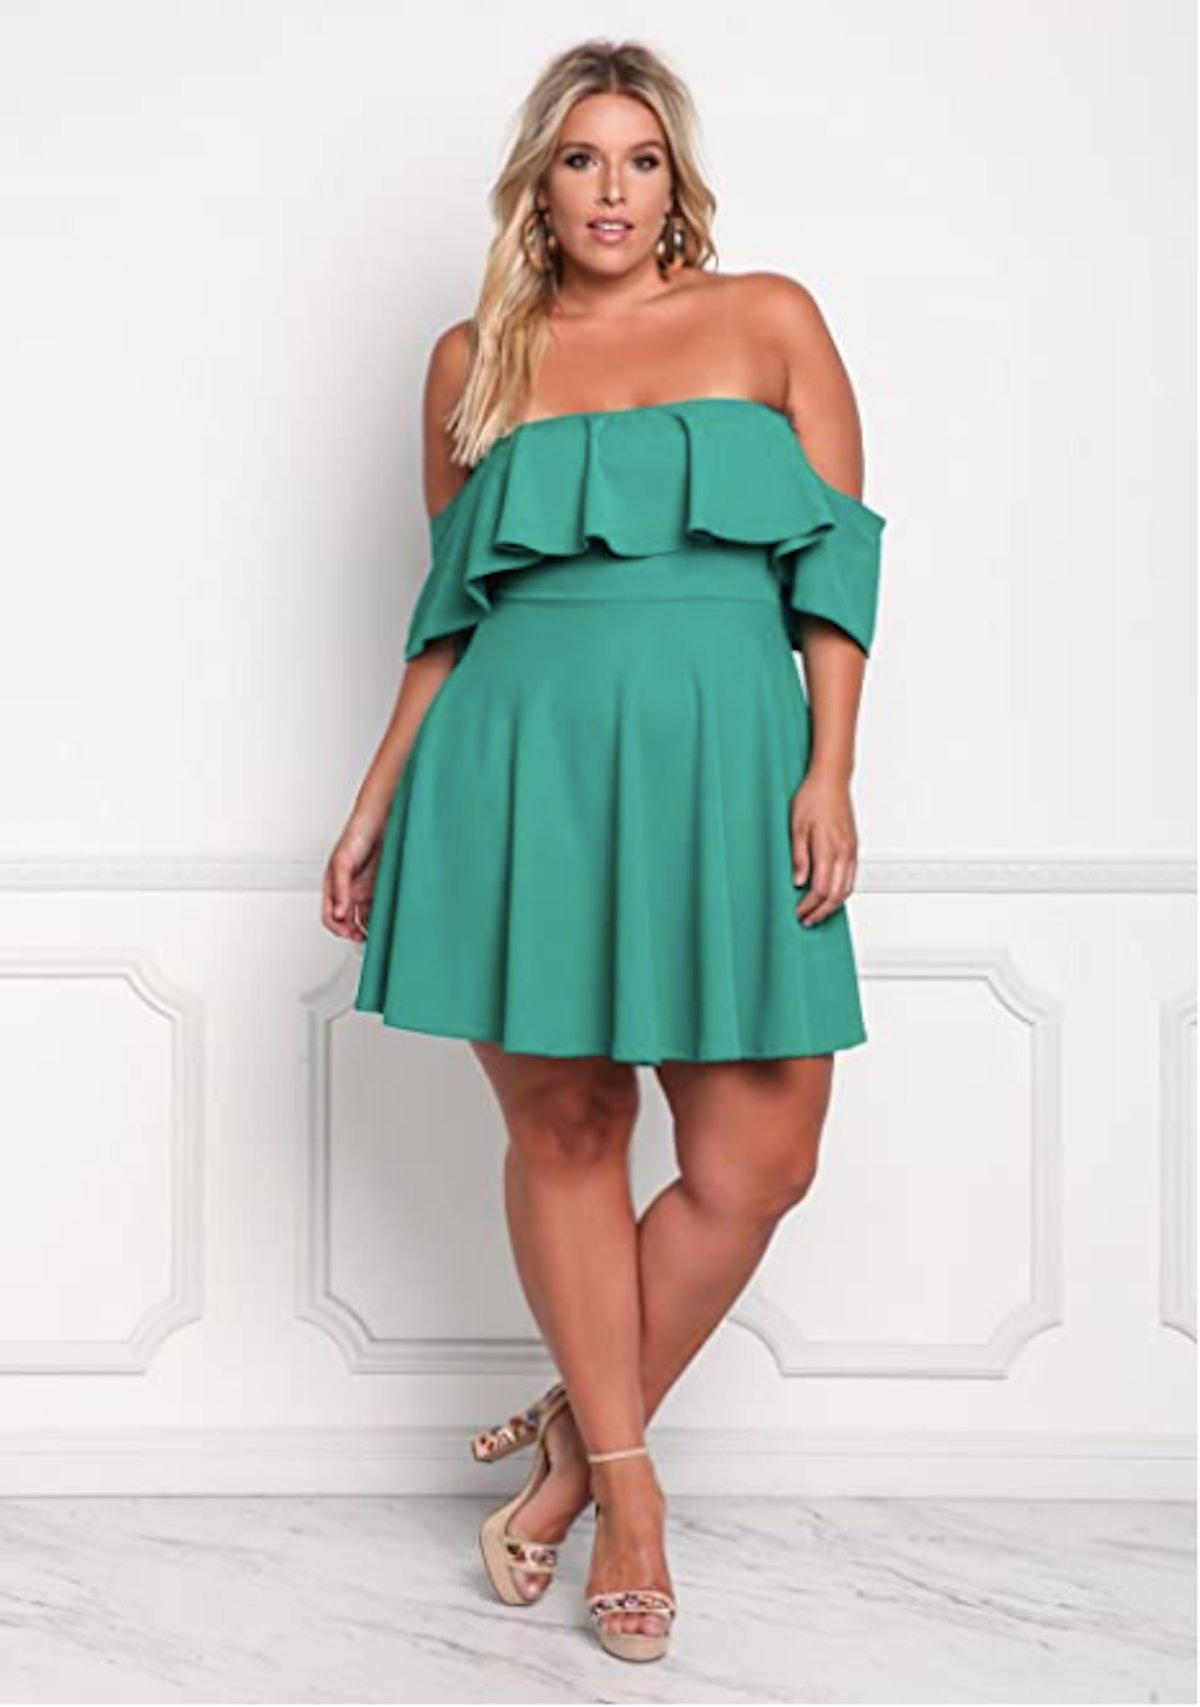 ROSIANNA Plus-Size Off The Shoulder Ruffled Mini Dress